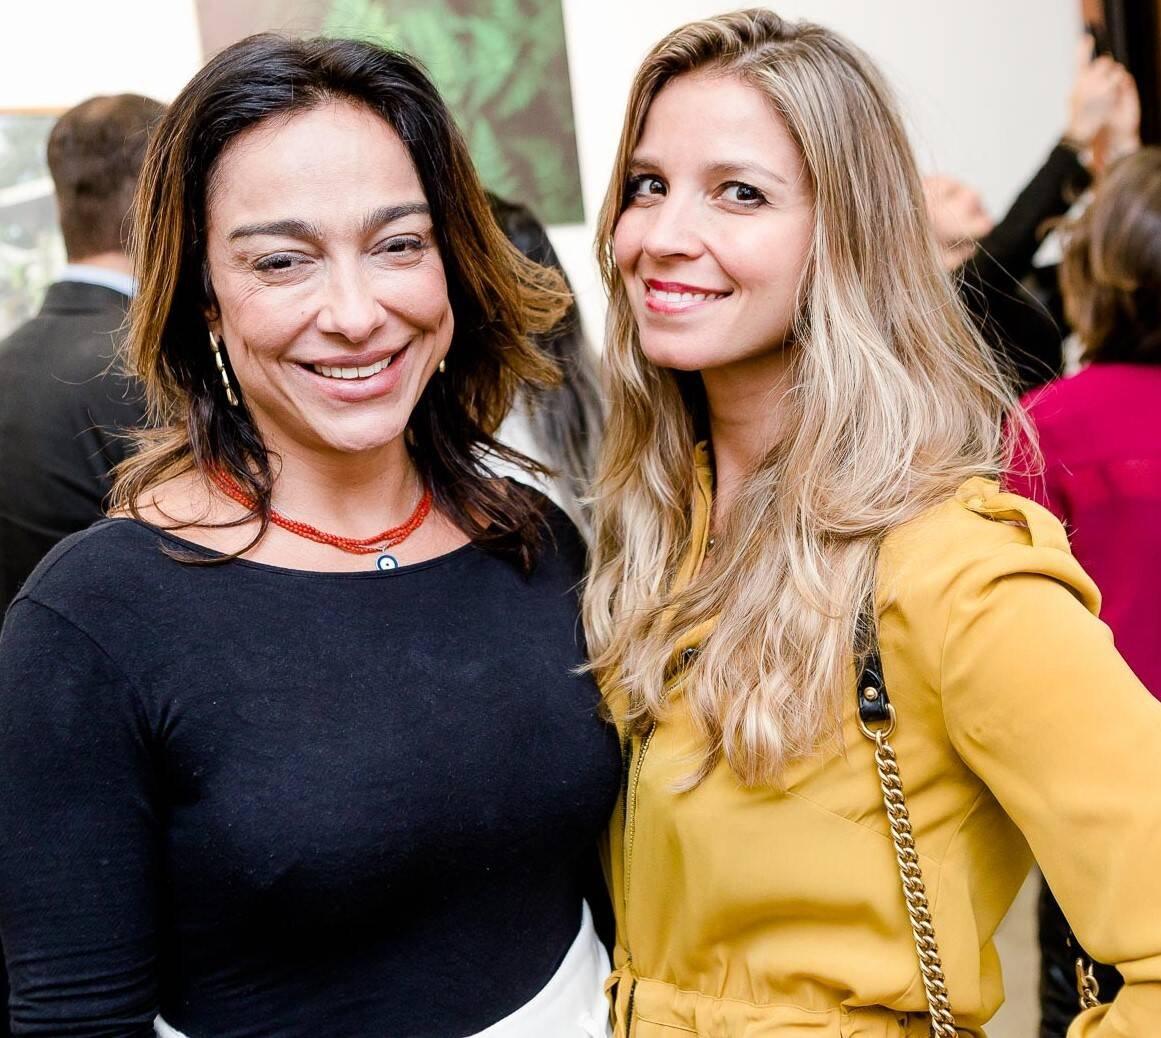 Ana Paula Iespa e Aline Araujo  /Foto: Bruno Ryfer